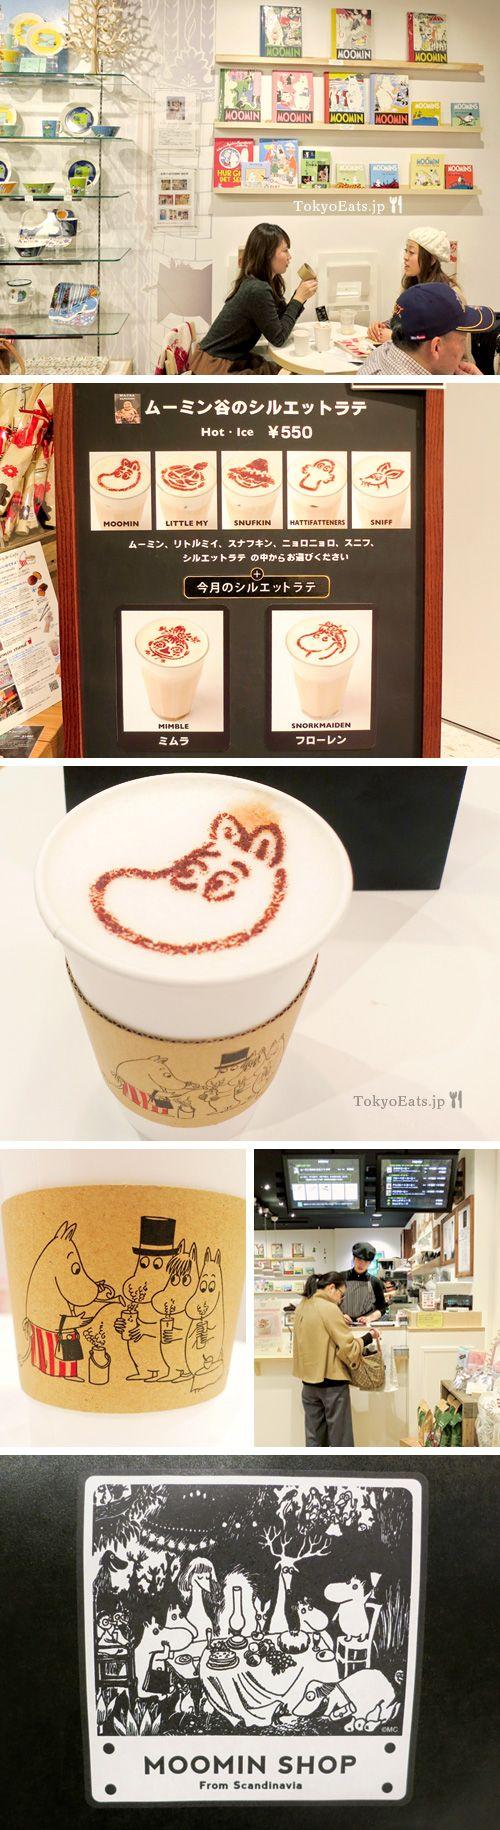 Moomin Shop & Delfonics Dogwood Plaza, Tokyo